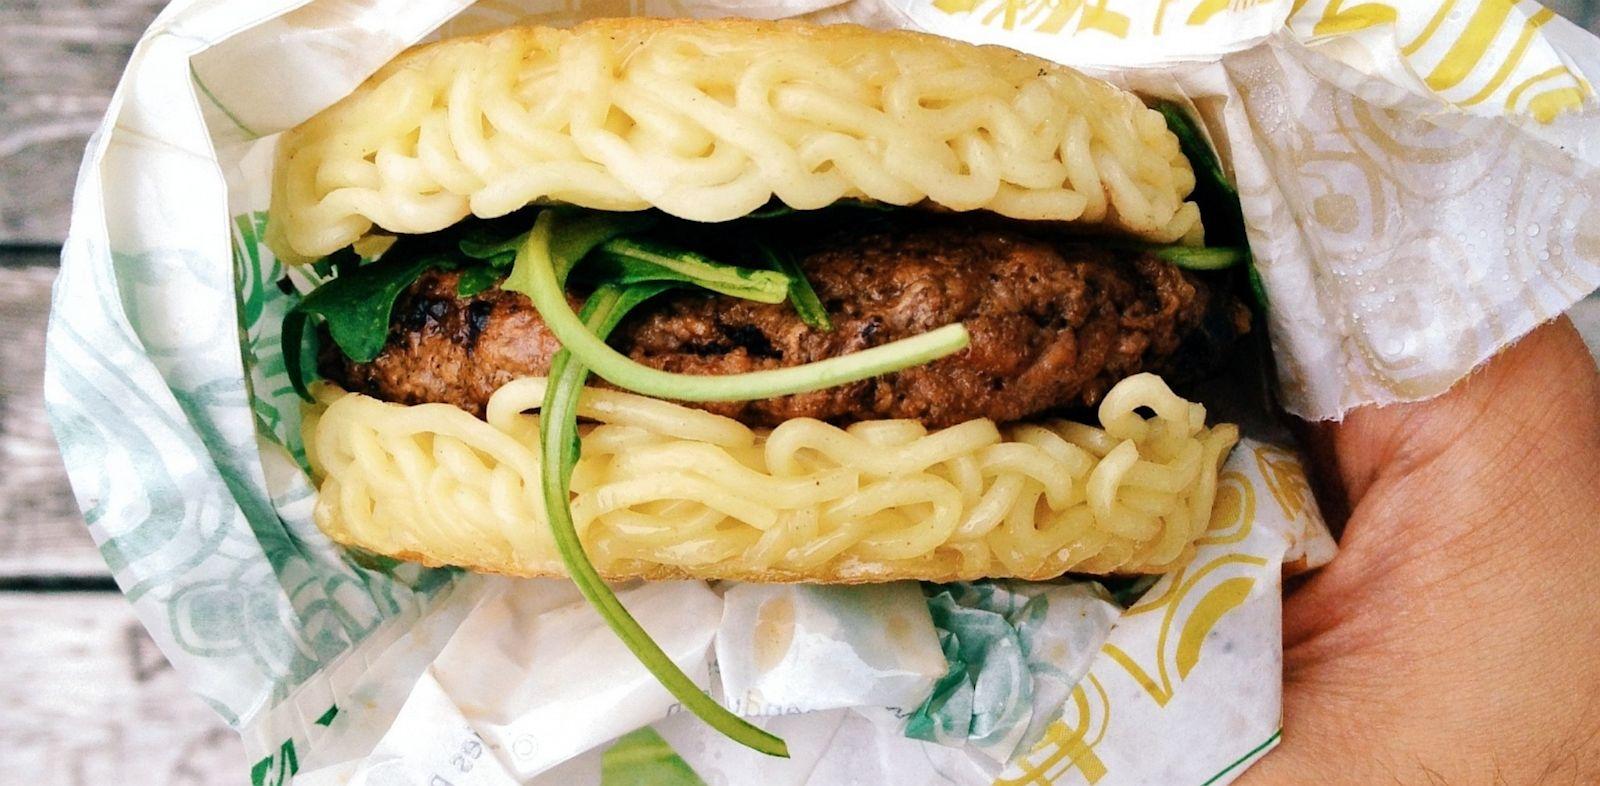 PHOTO: Keizo Shimamotos Ramen Burger is shown.